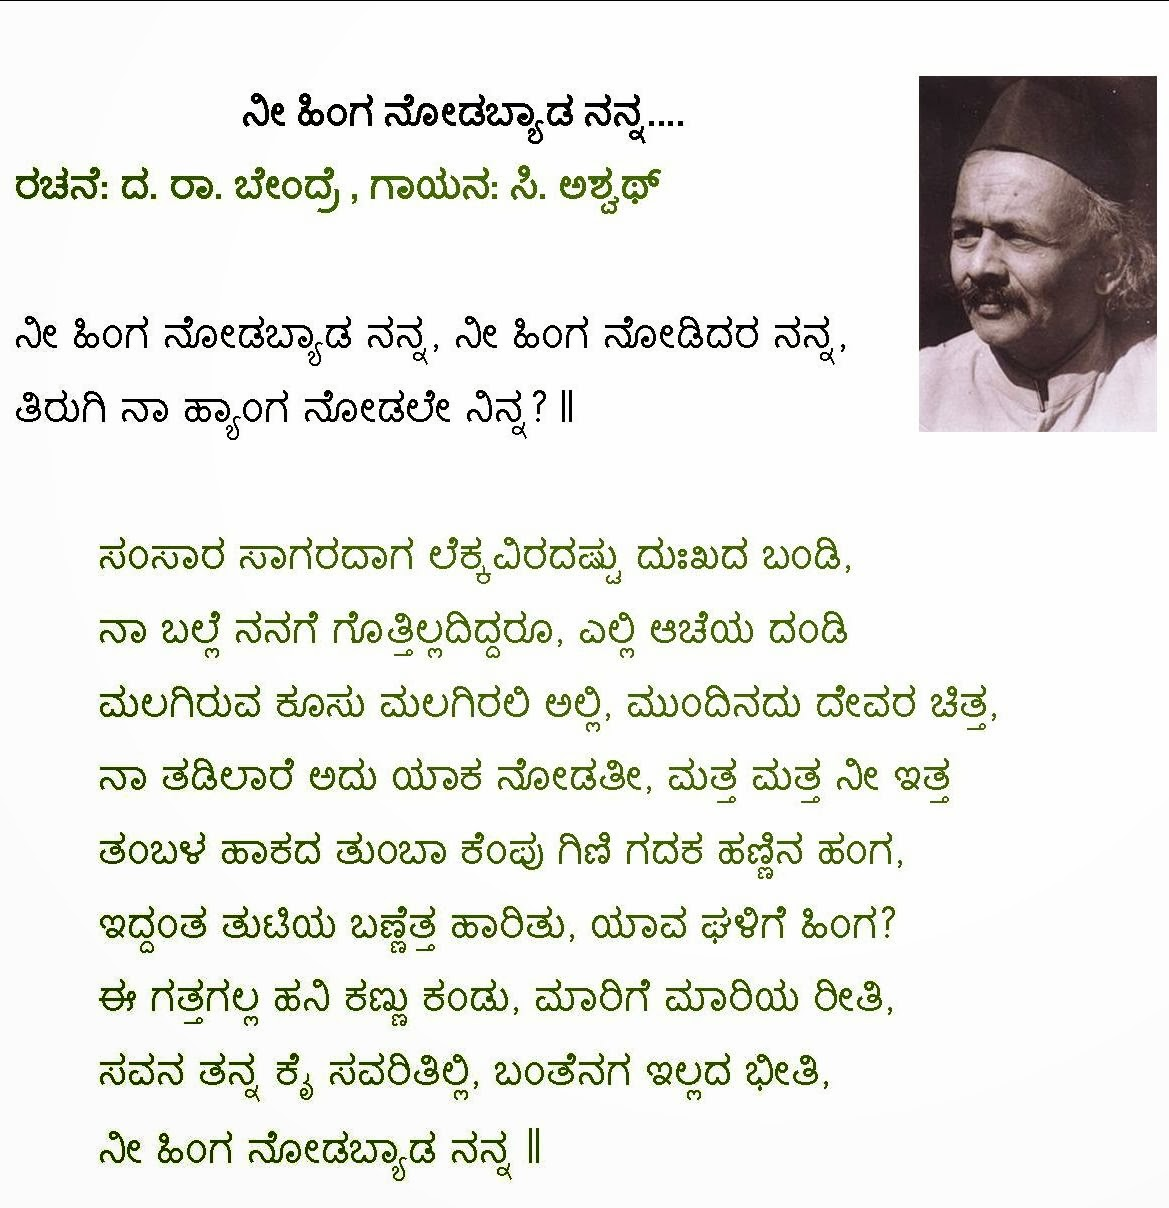 essay on kuvempu Kuvempu essay, ಕುವೆಂಪು ಪ್ರಬಂಧ, , , translation, human translation, automatic translation.